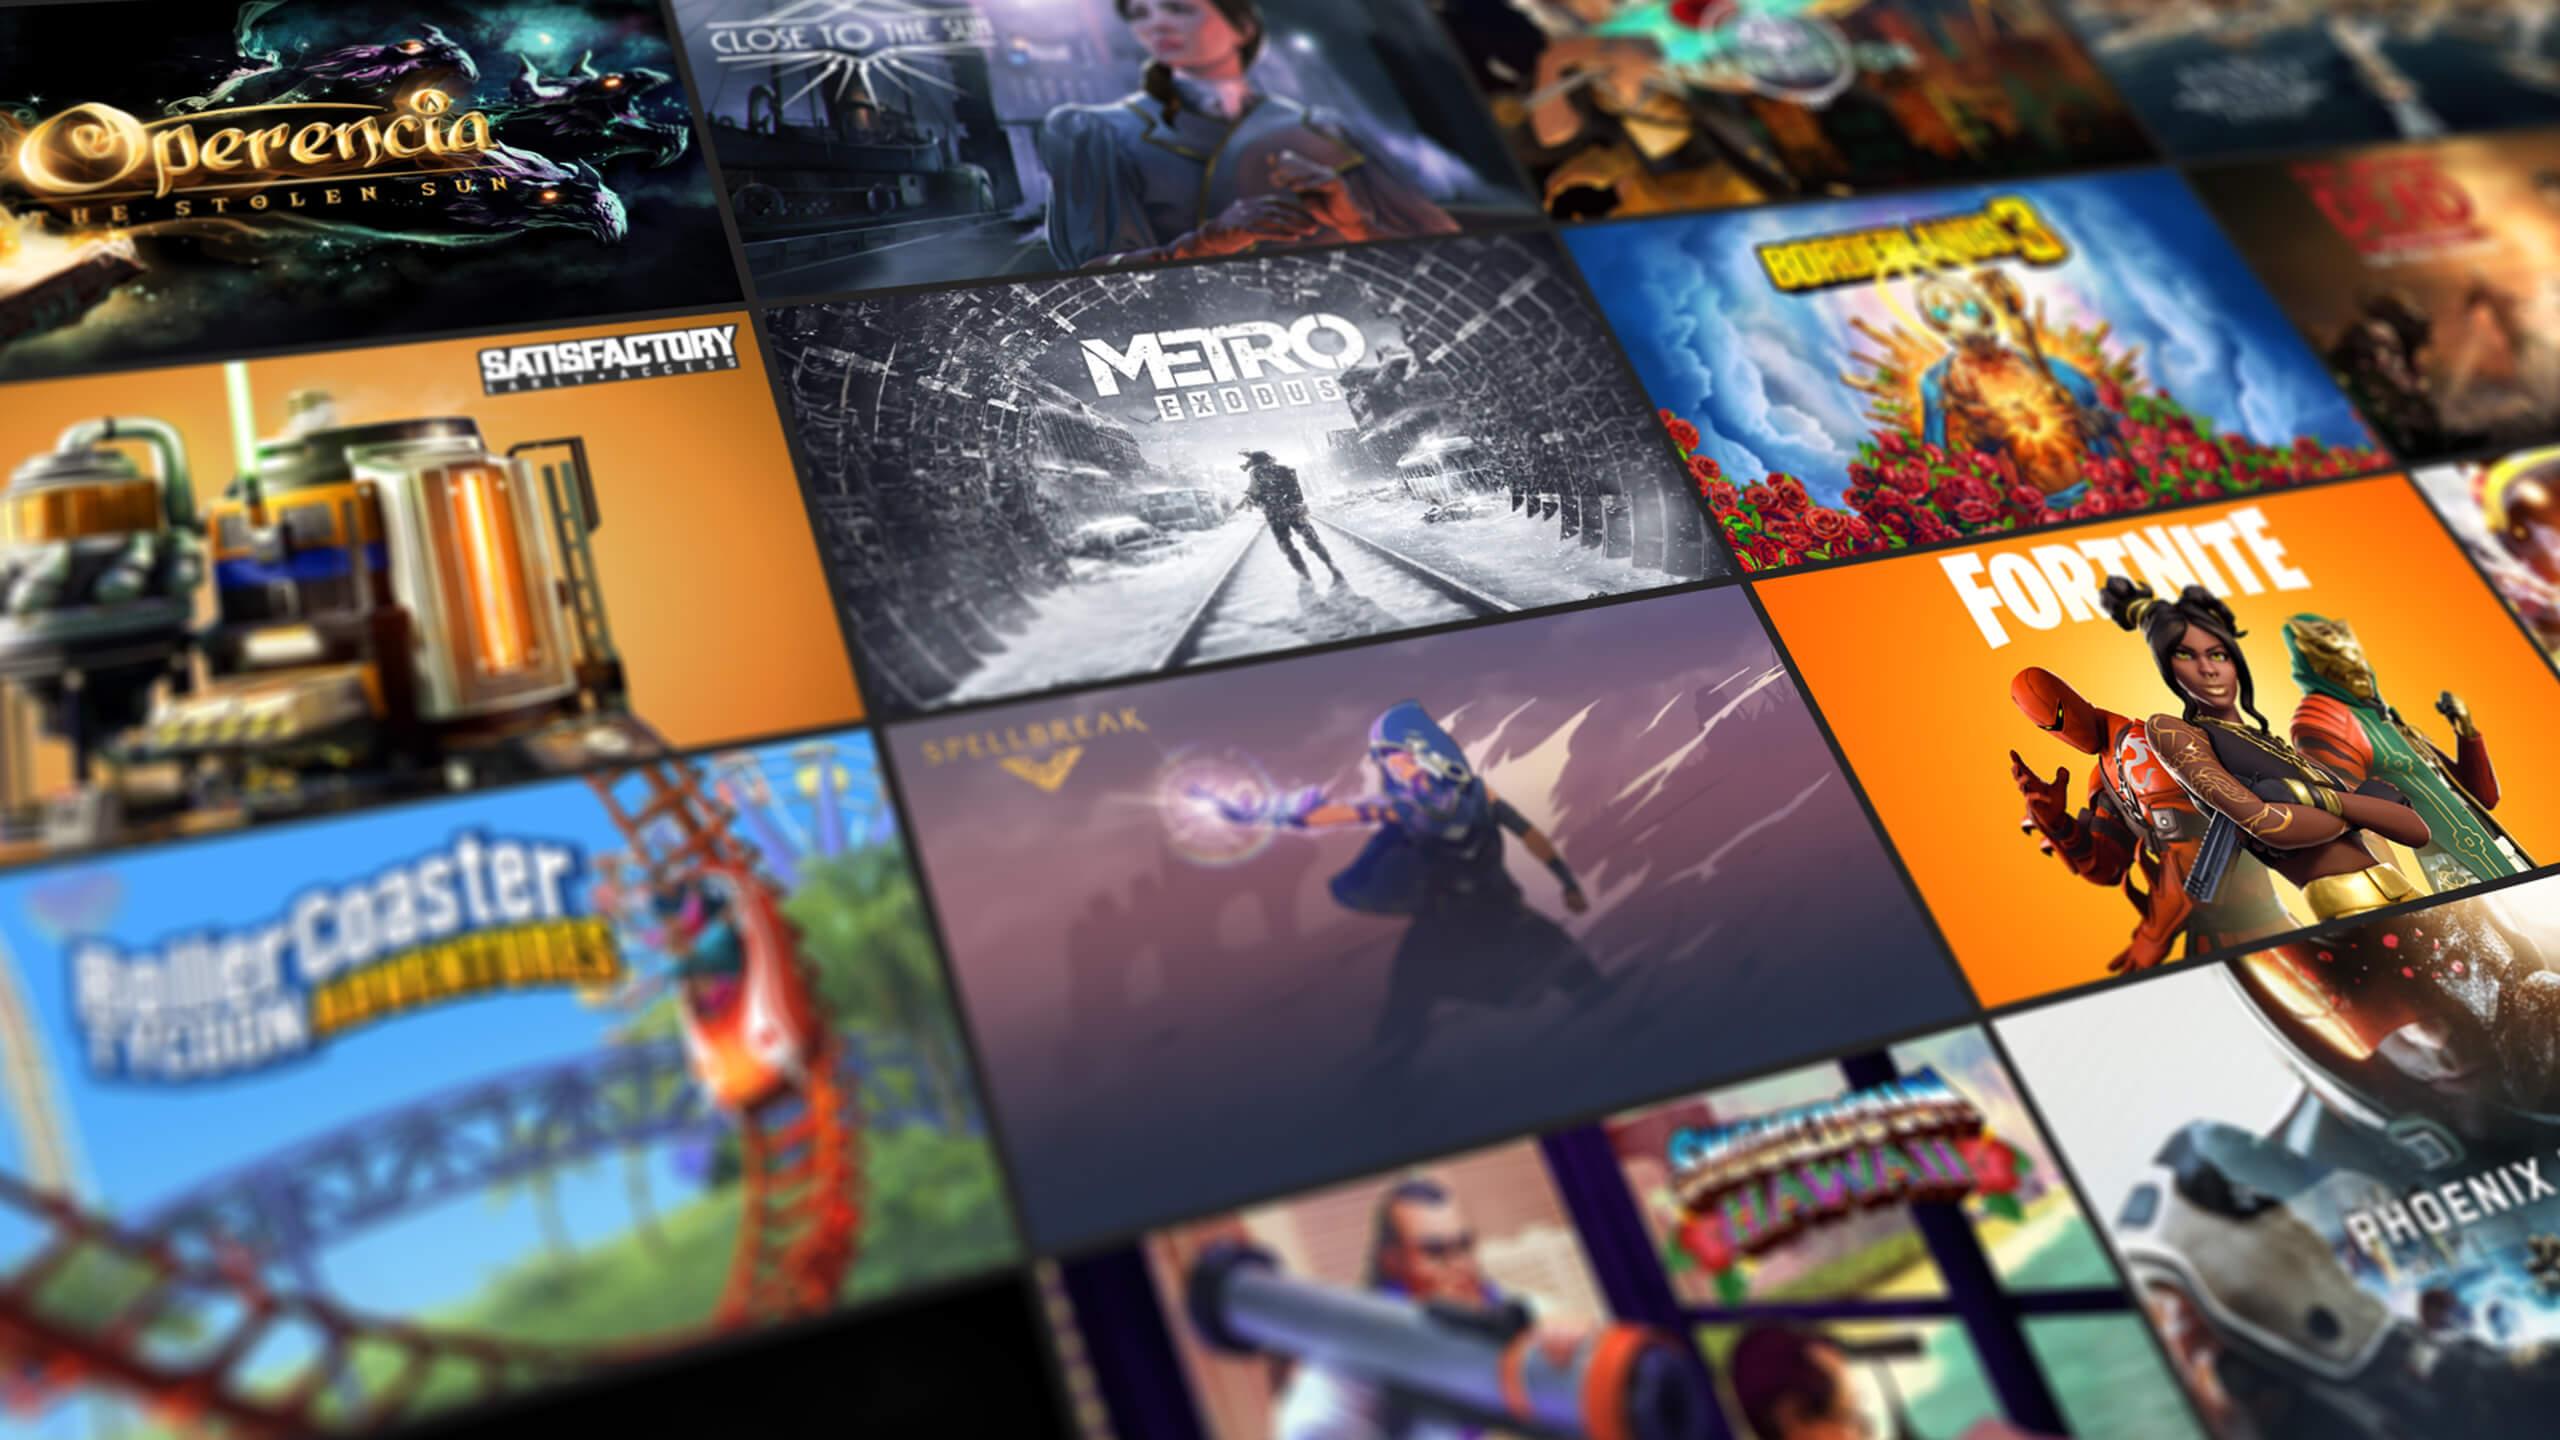 Epic Games appeals verdict in Apple antitrust case - SiliconANGLE